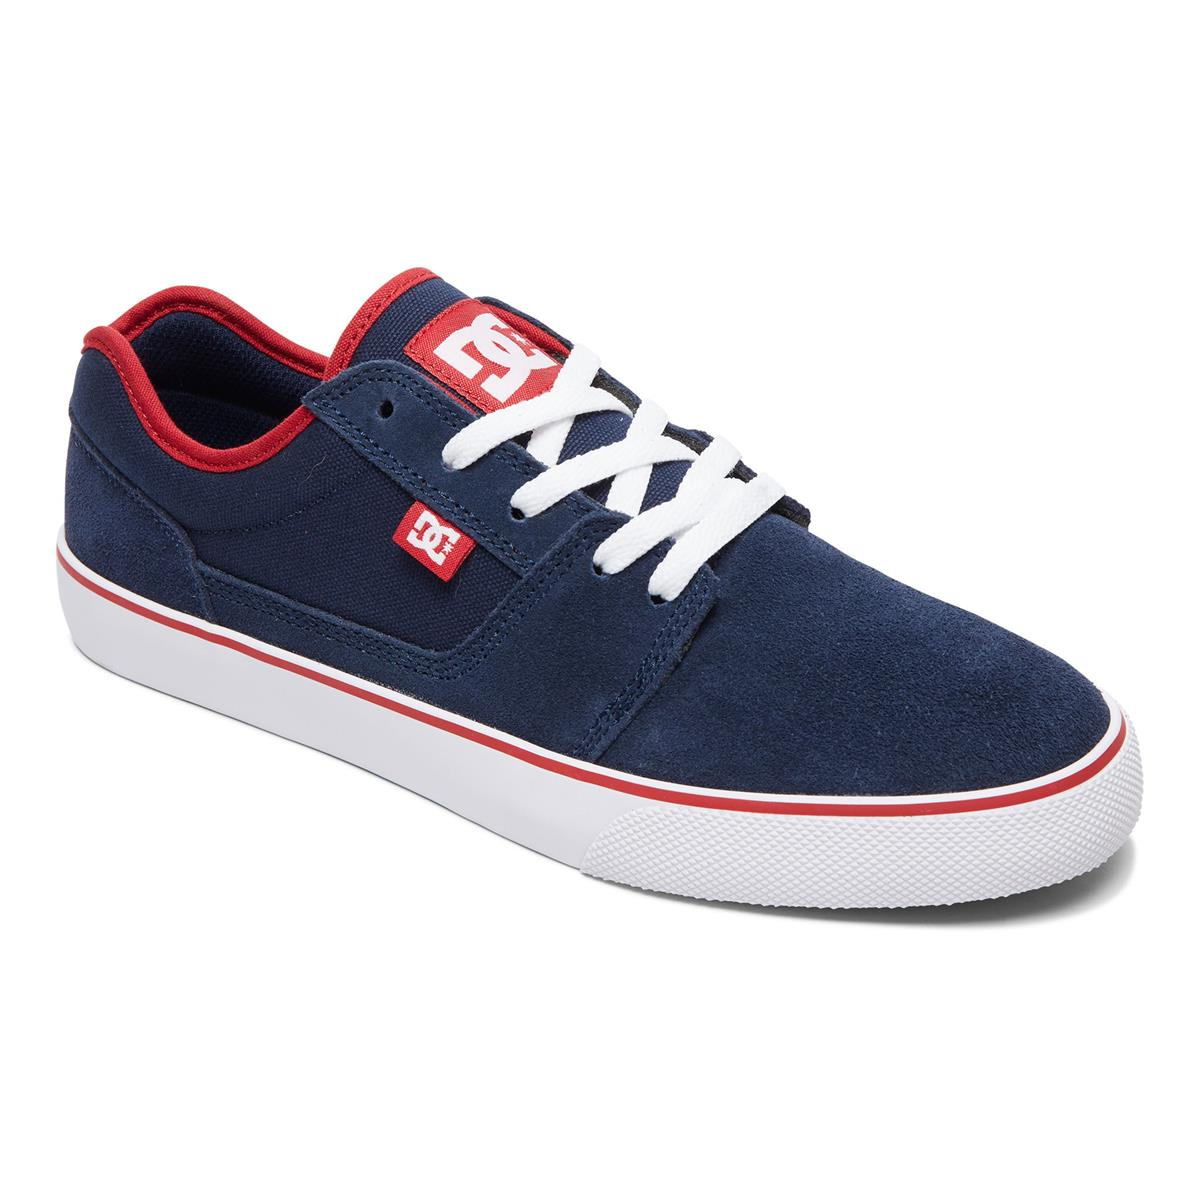 Dc Dc Dc Chaussures tonics Navy/rouge 206572